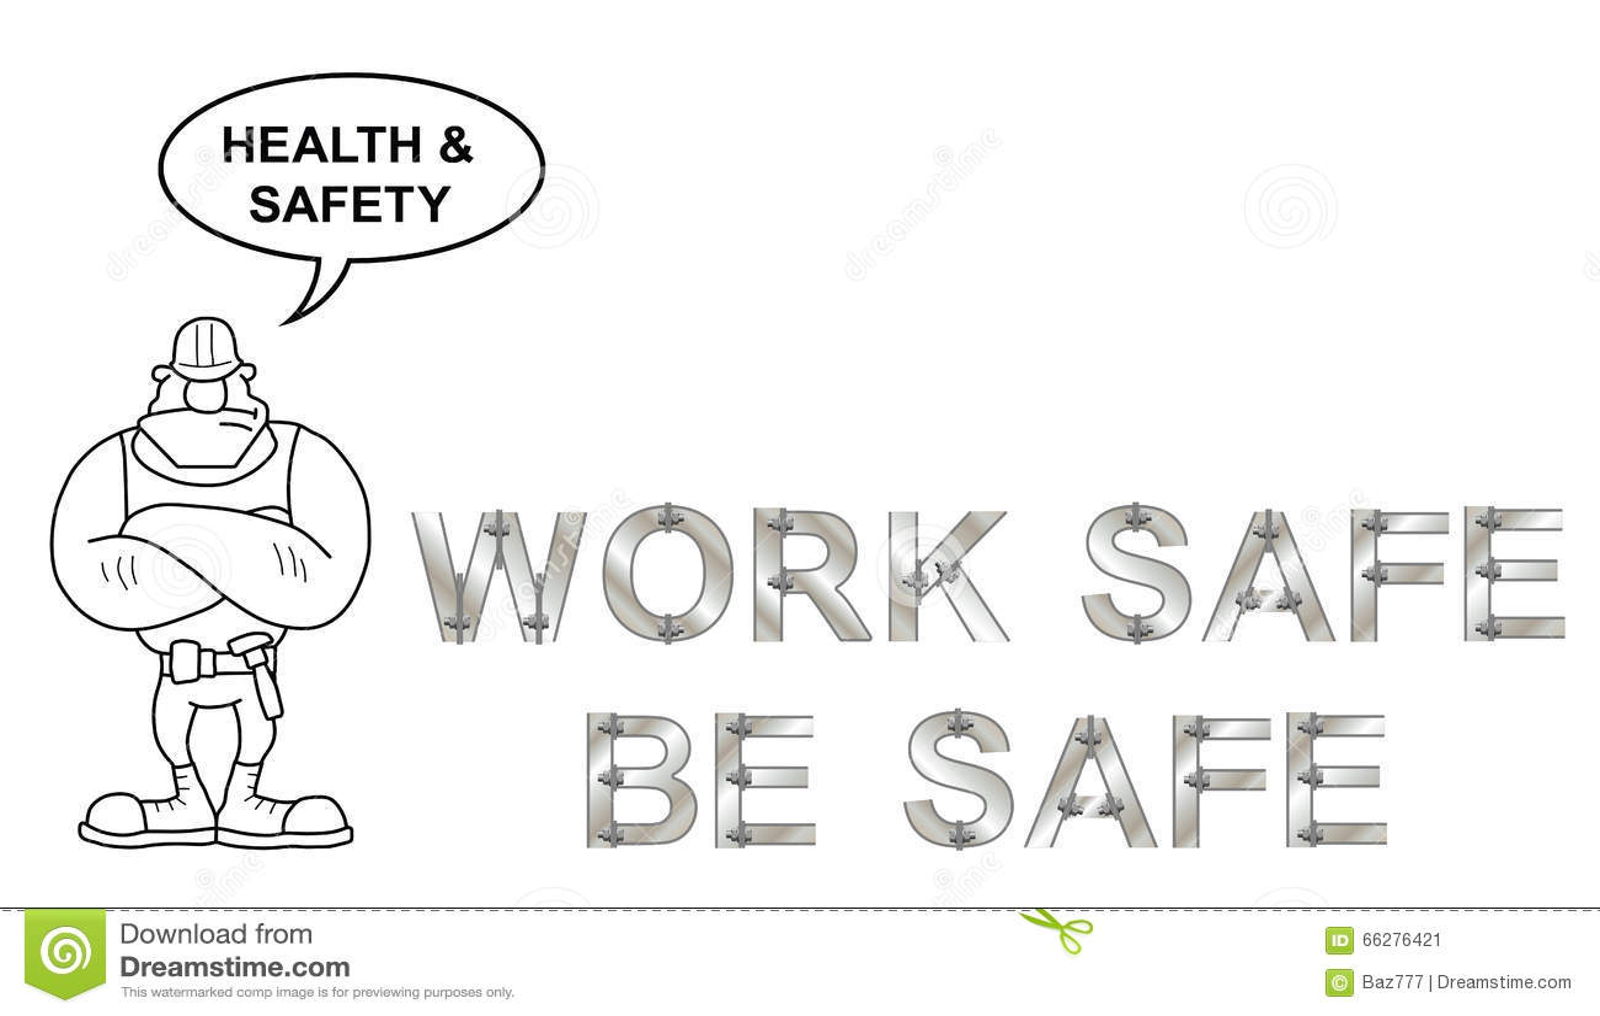 Is It Safe Cartoon